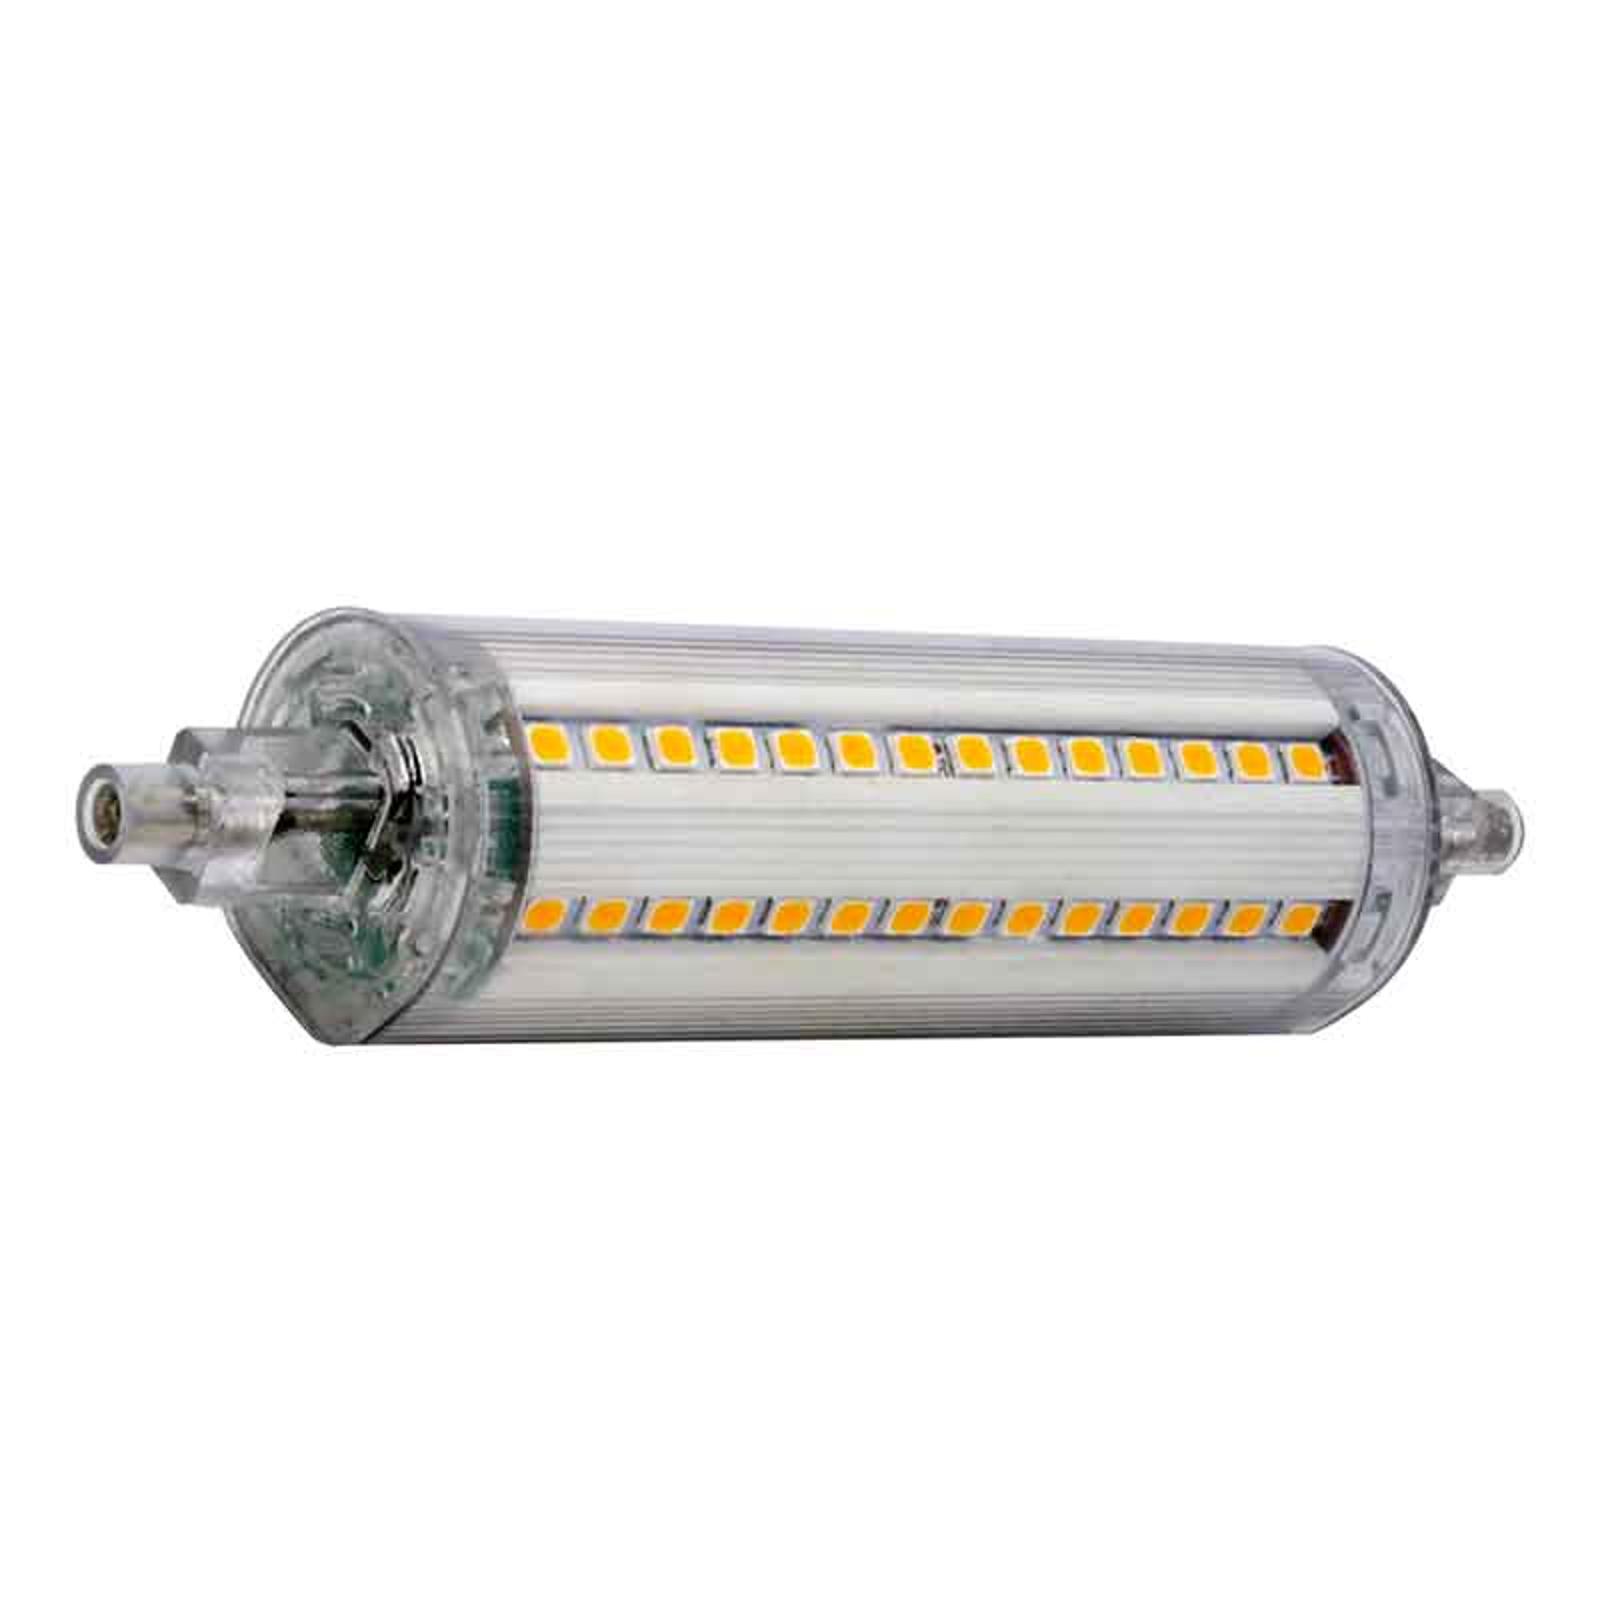 R7s 118 mm LED-stav 9 W universalhvit